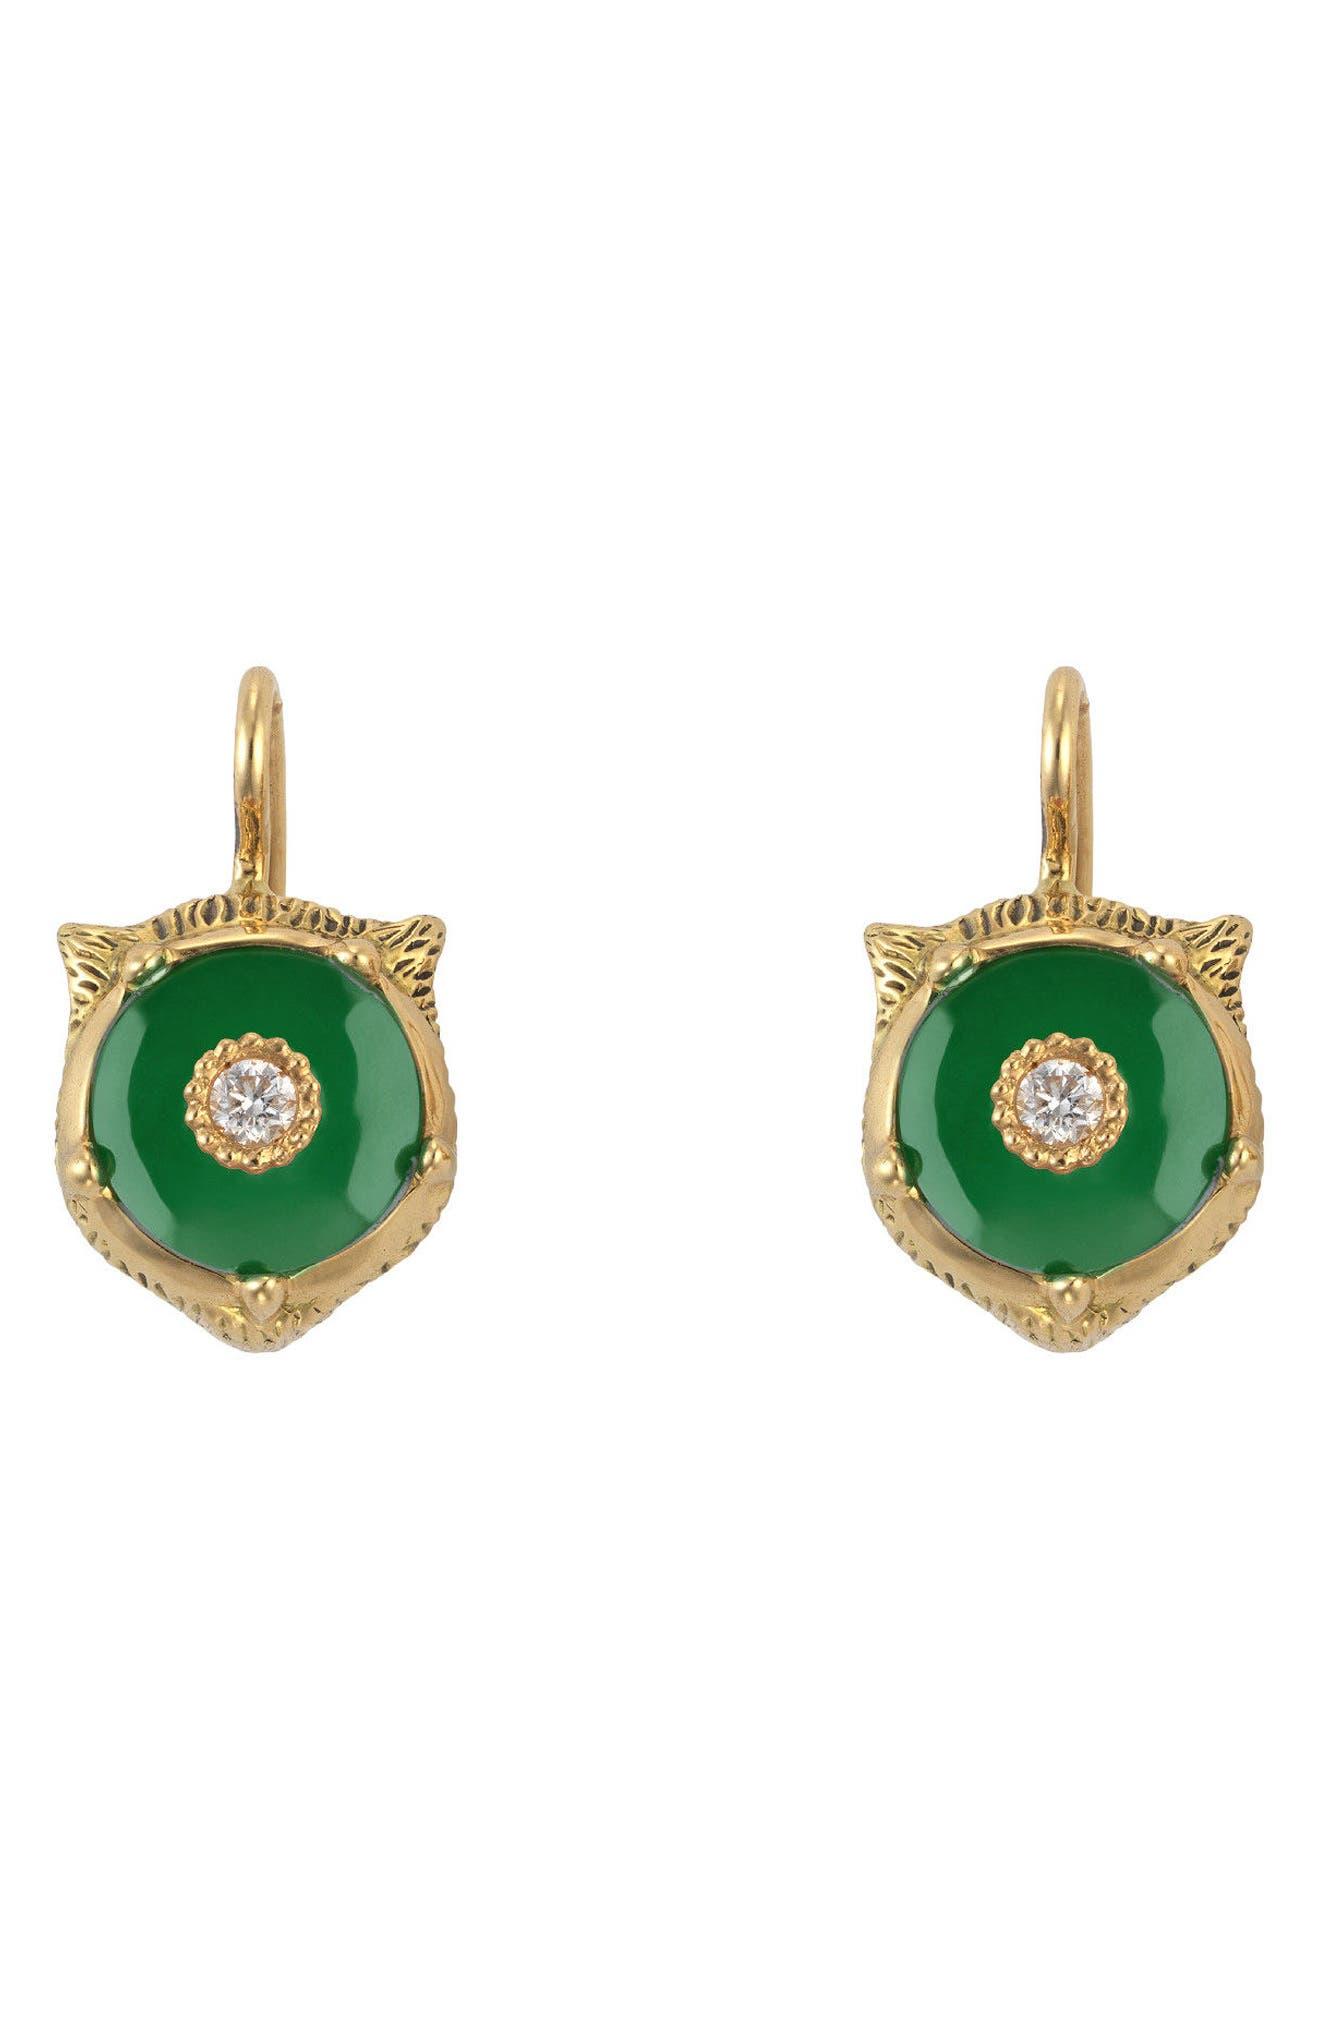 Feline Head Earrings,                             Main thumbnail 1, color,                             Yellow Gold/ Green Jade